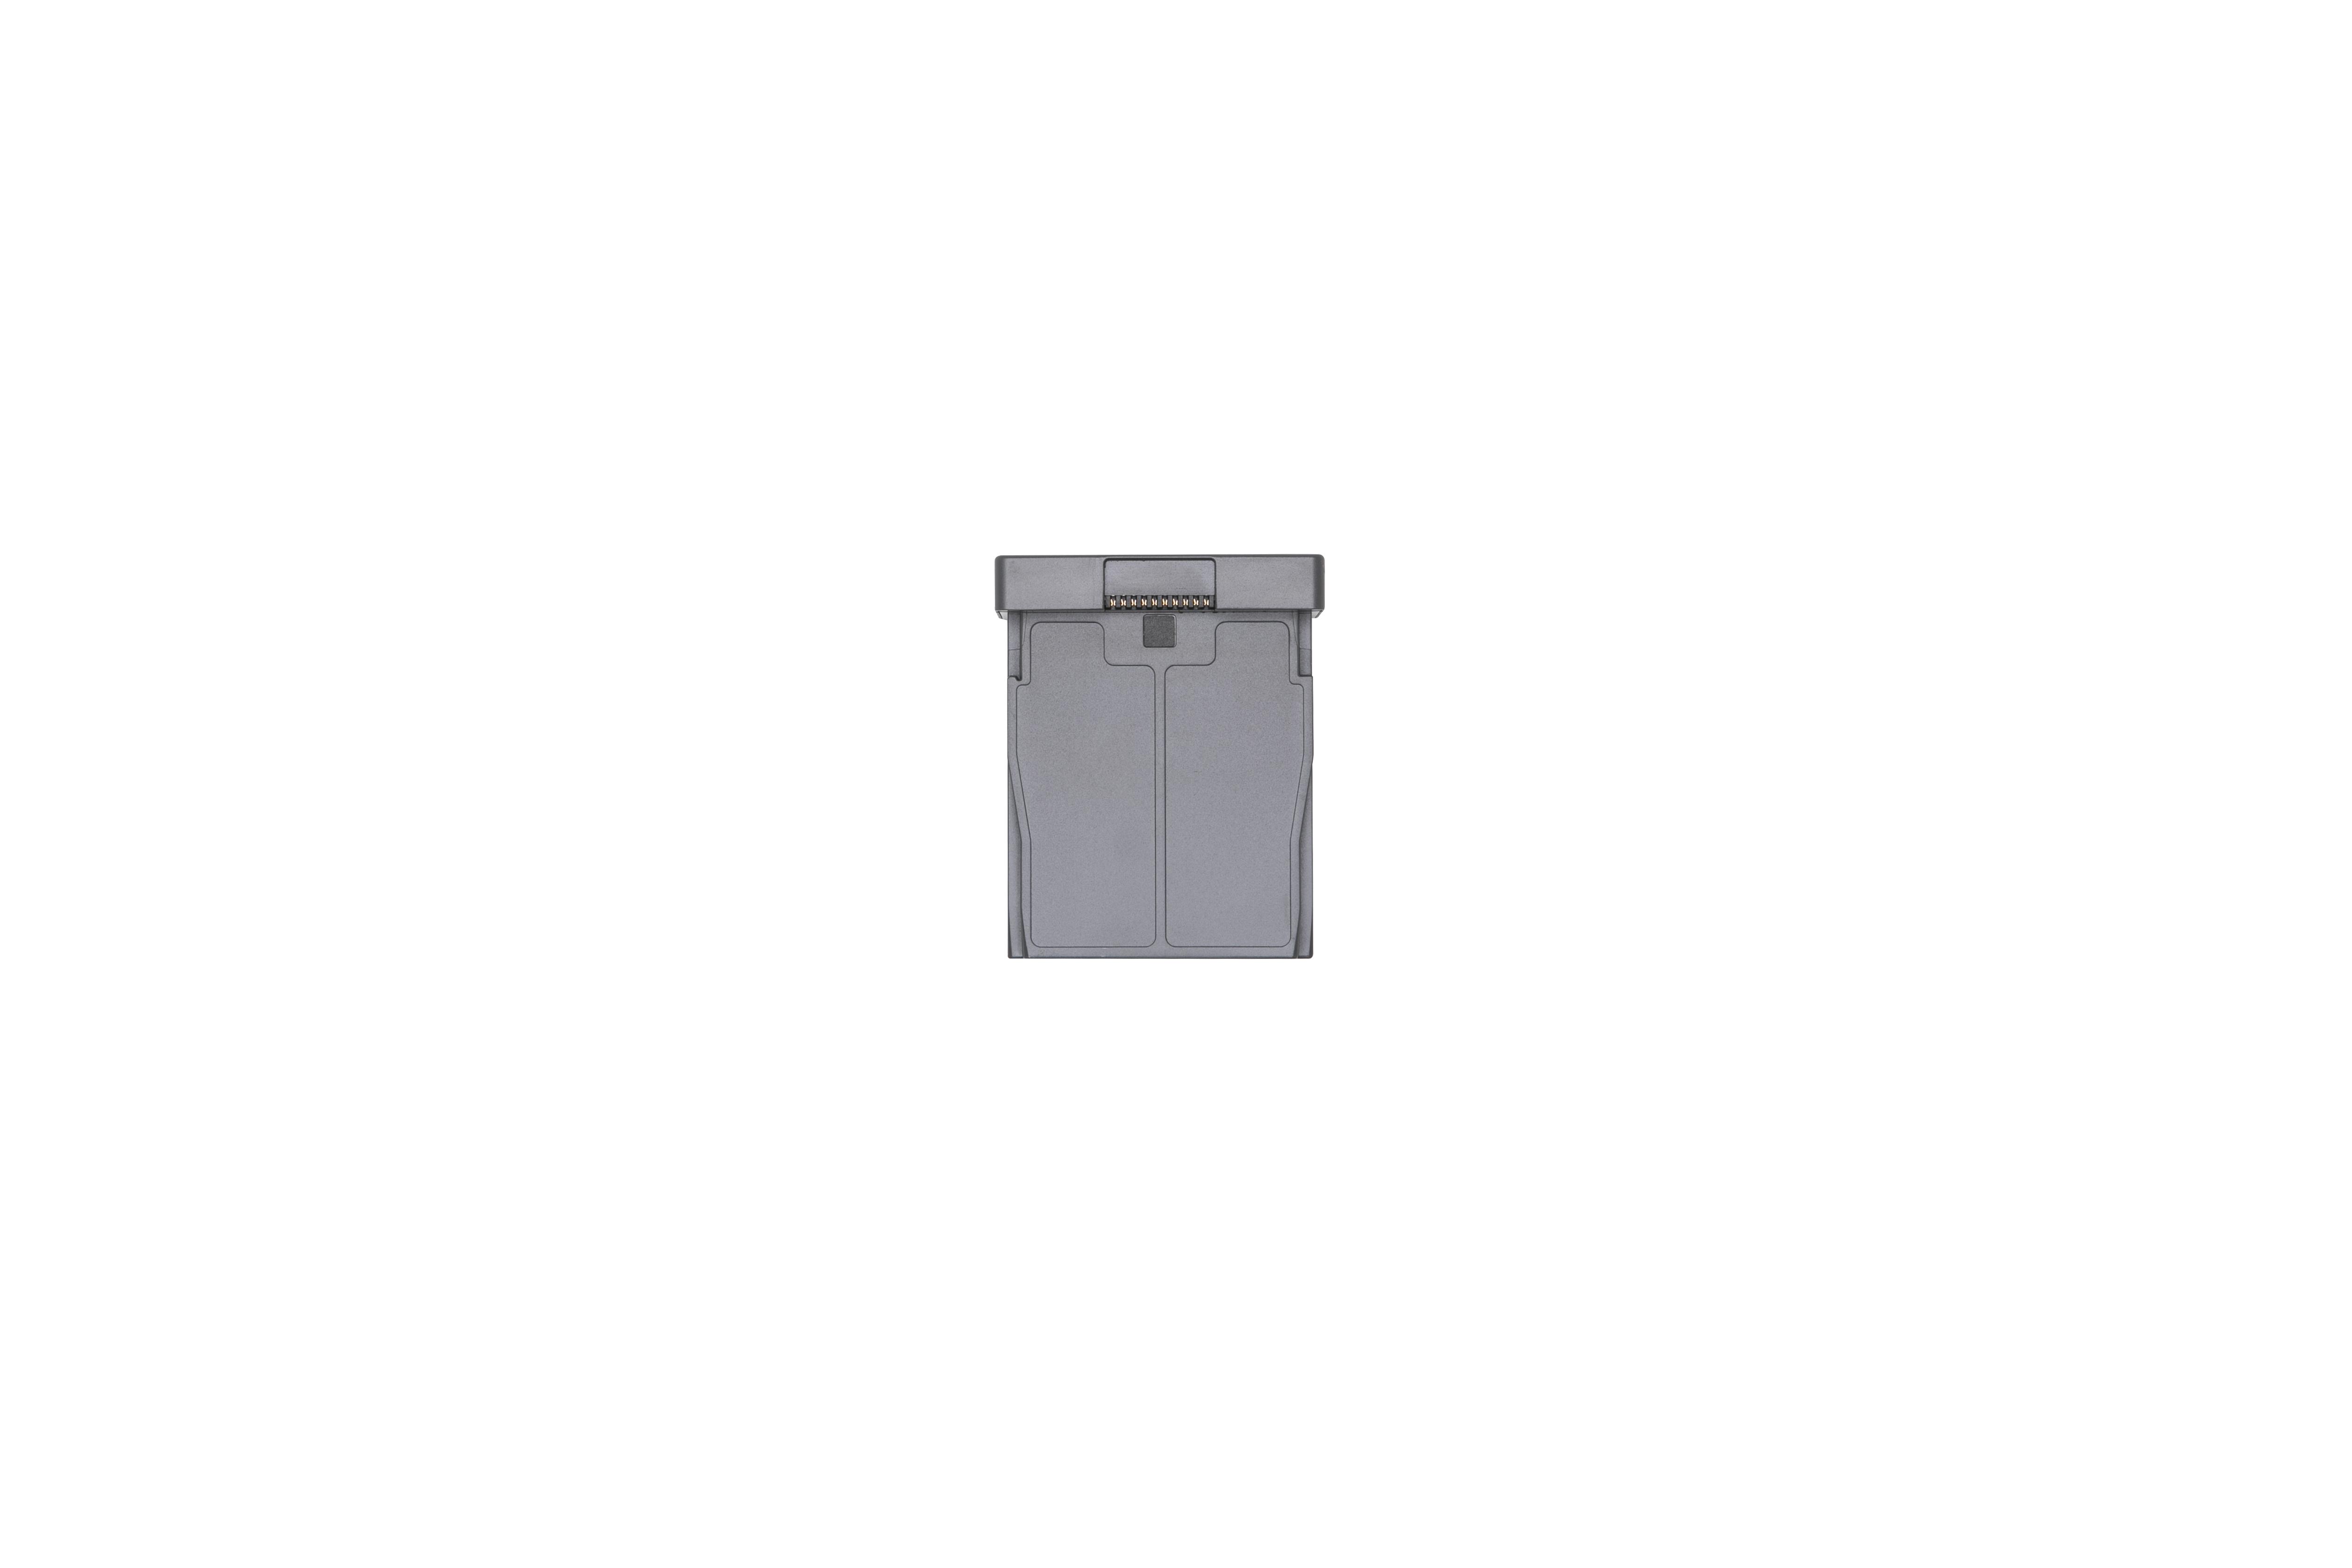 Dji - RoboMaster - S1 Part 3 Intelligent Battery